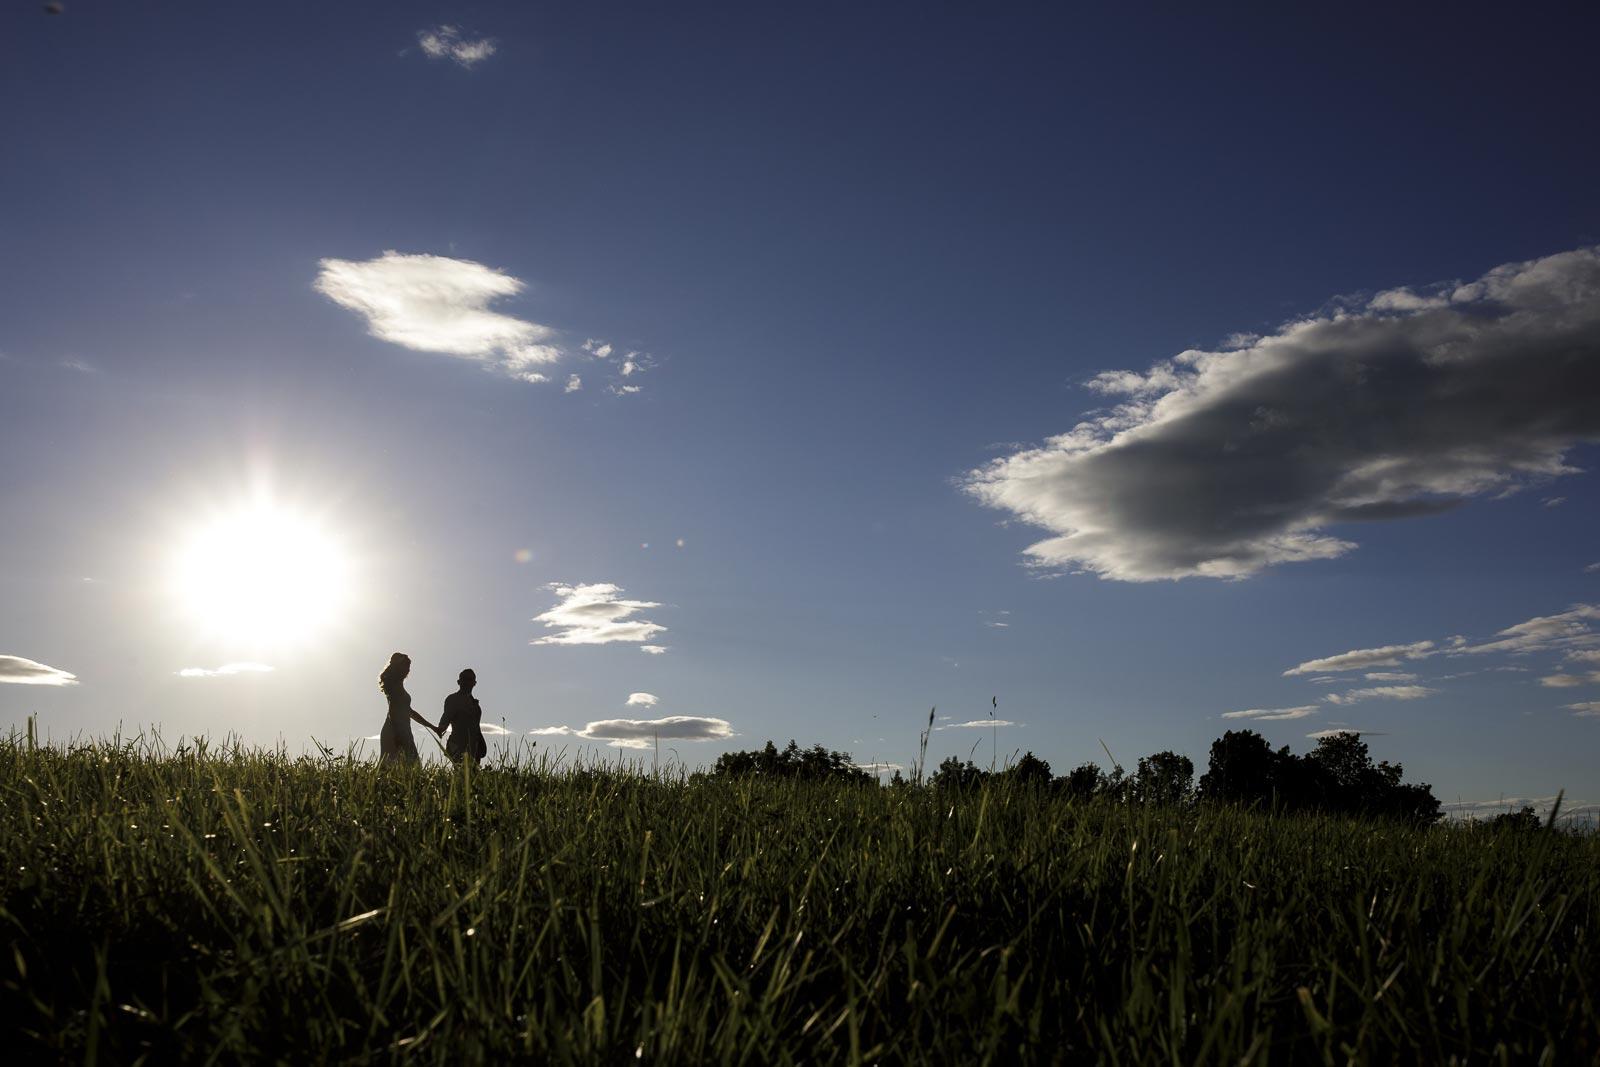 barn-at-liberty-farms-wedding-hudson-valley-alekseyk-photography-49.jpg